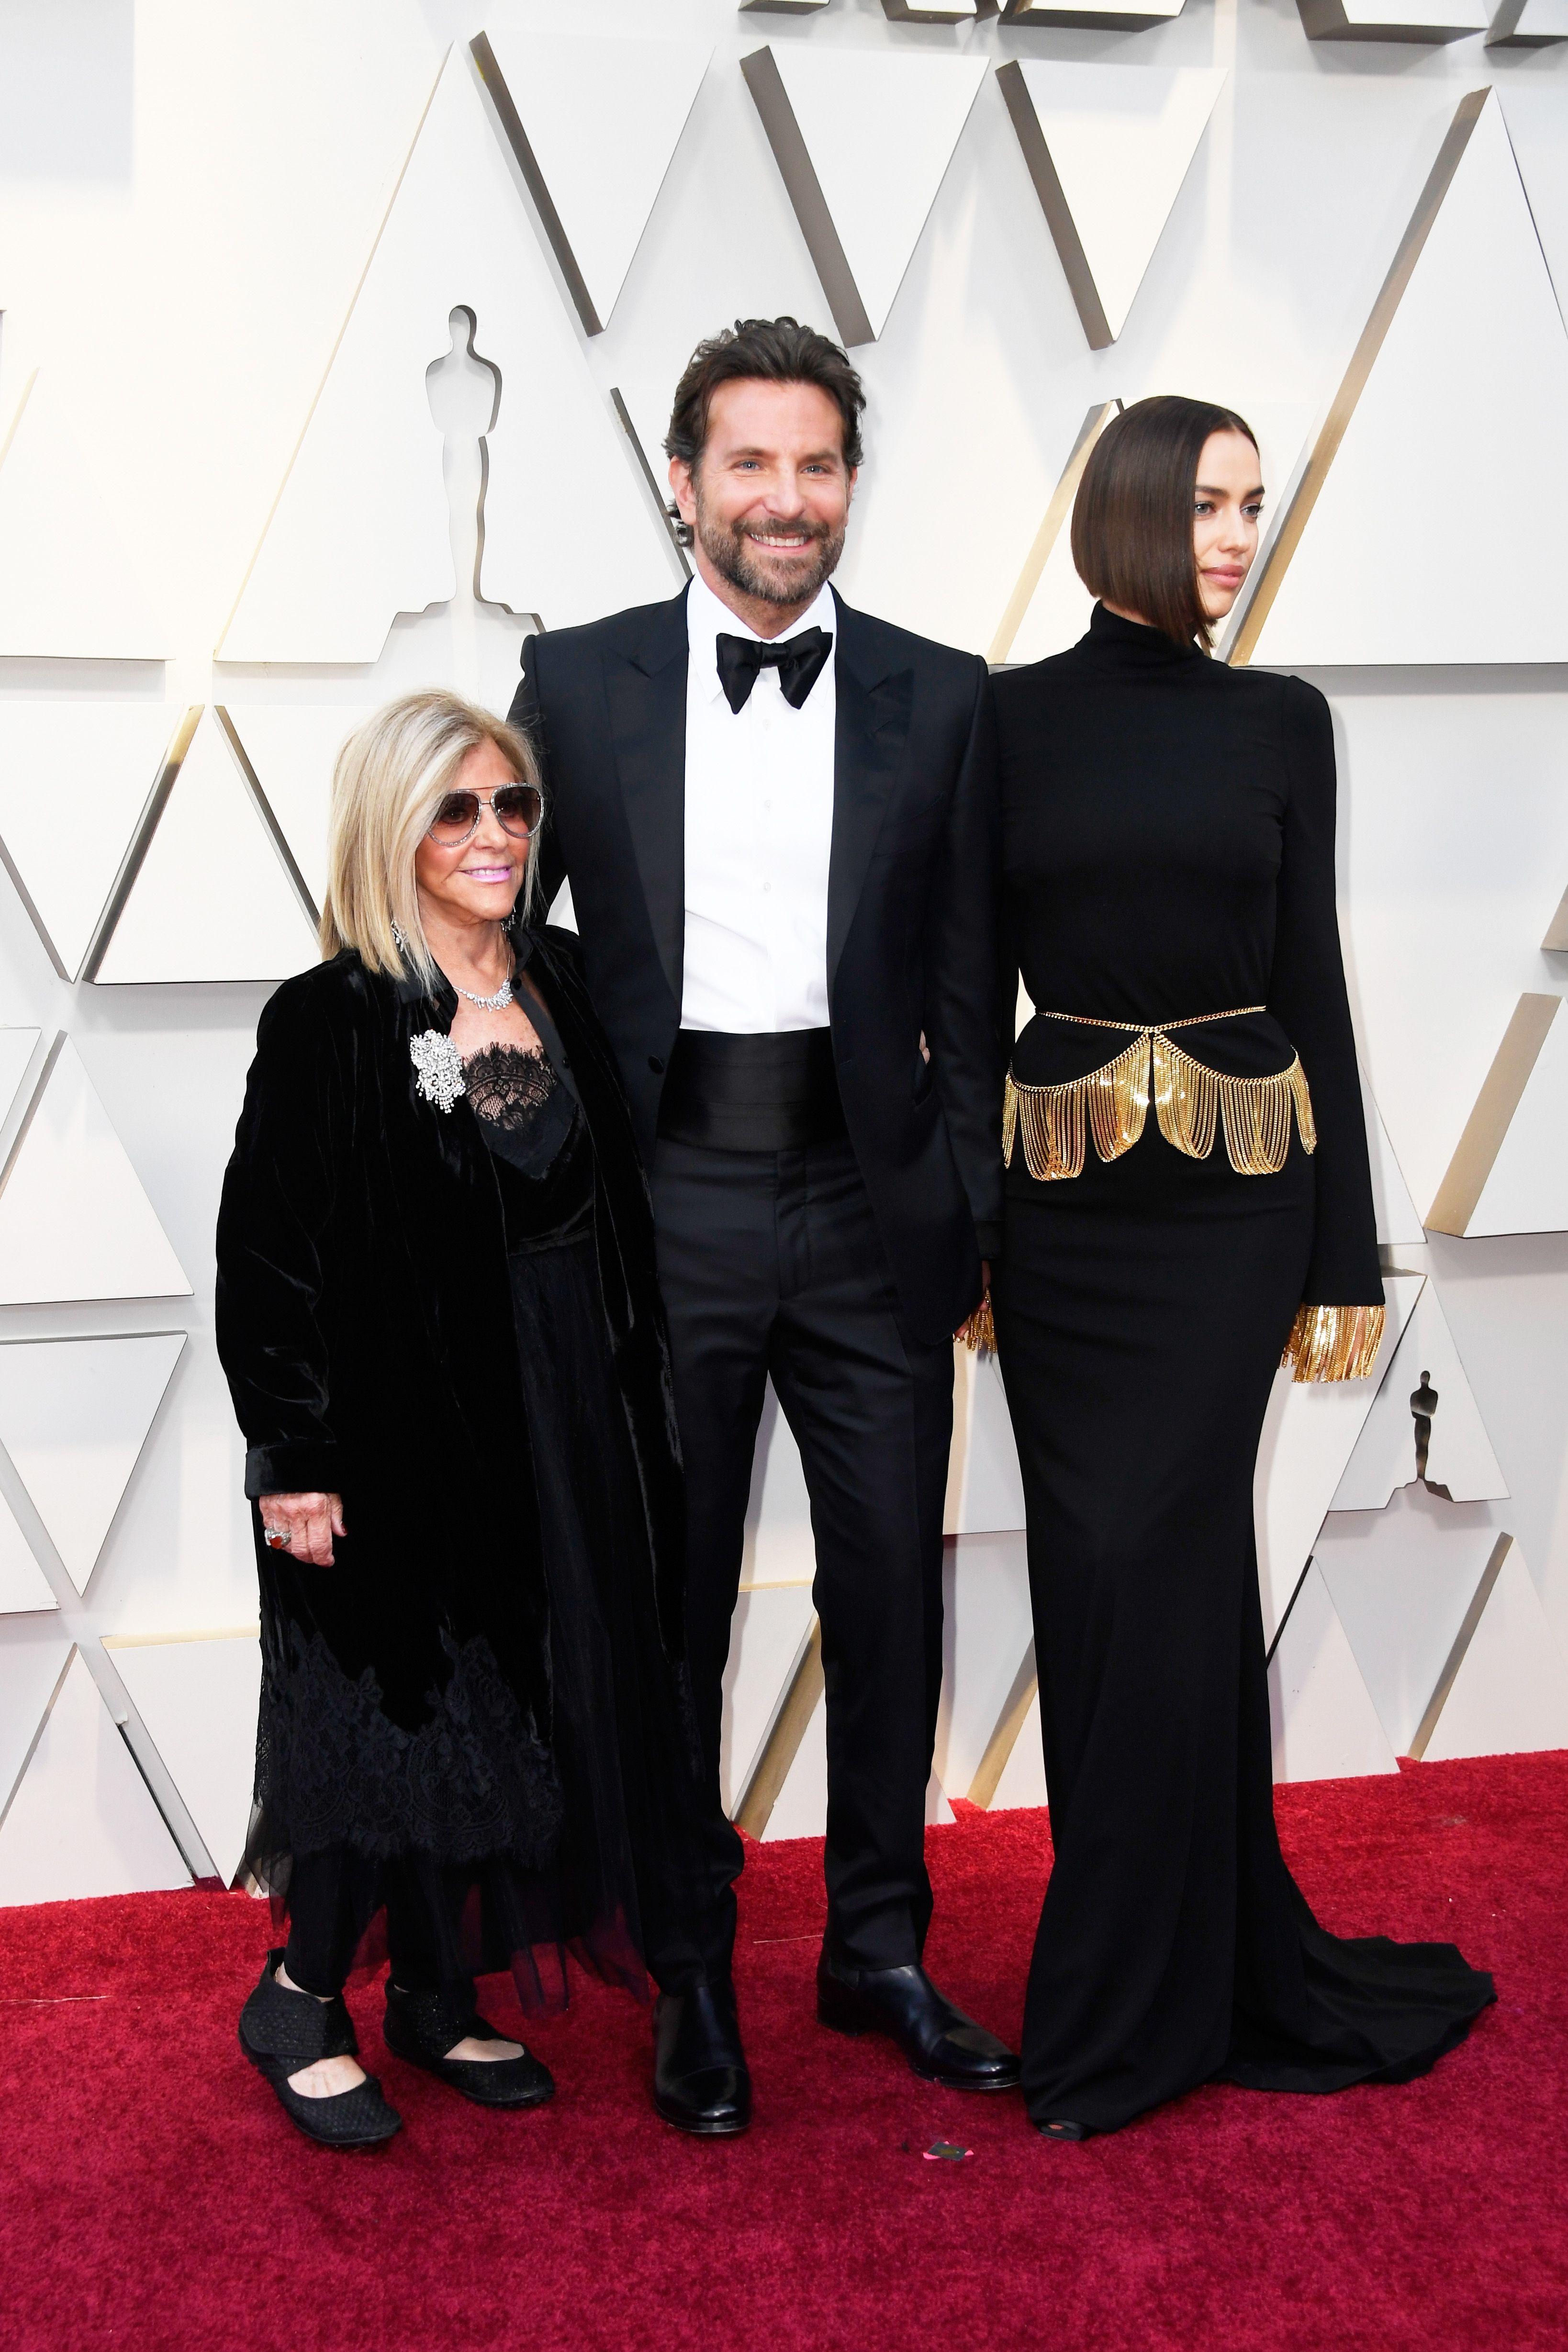 Wie is Bradley Cooper dating WDW